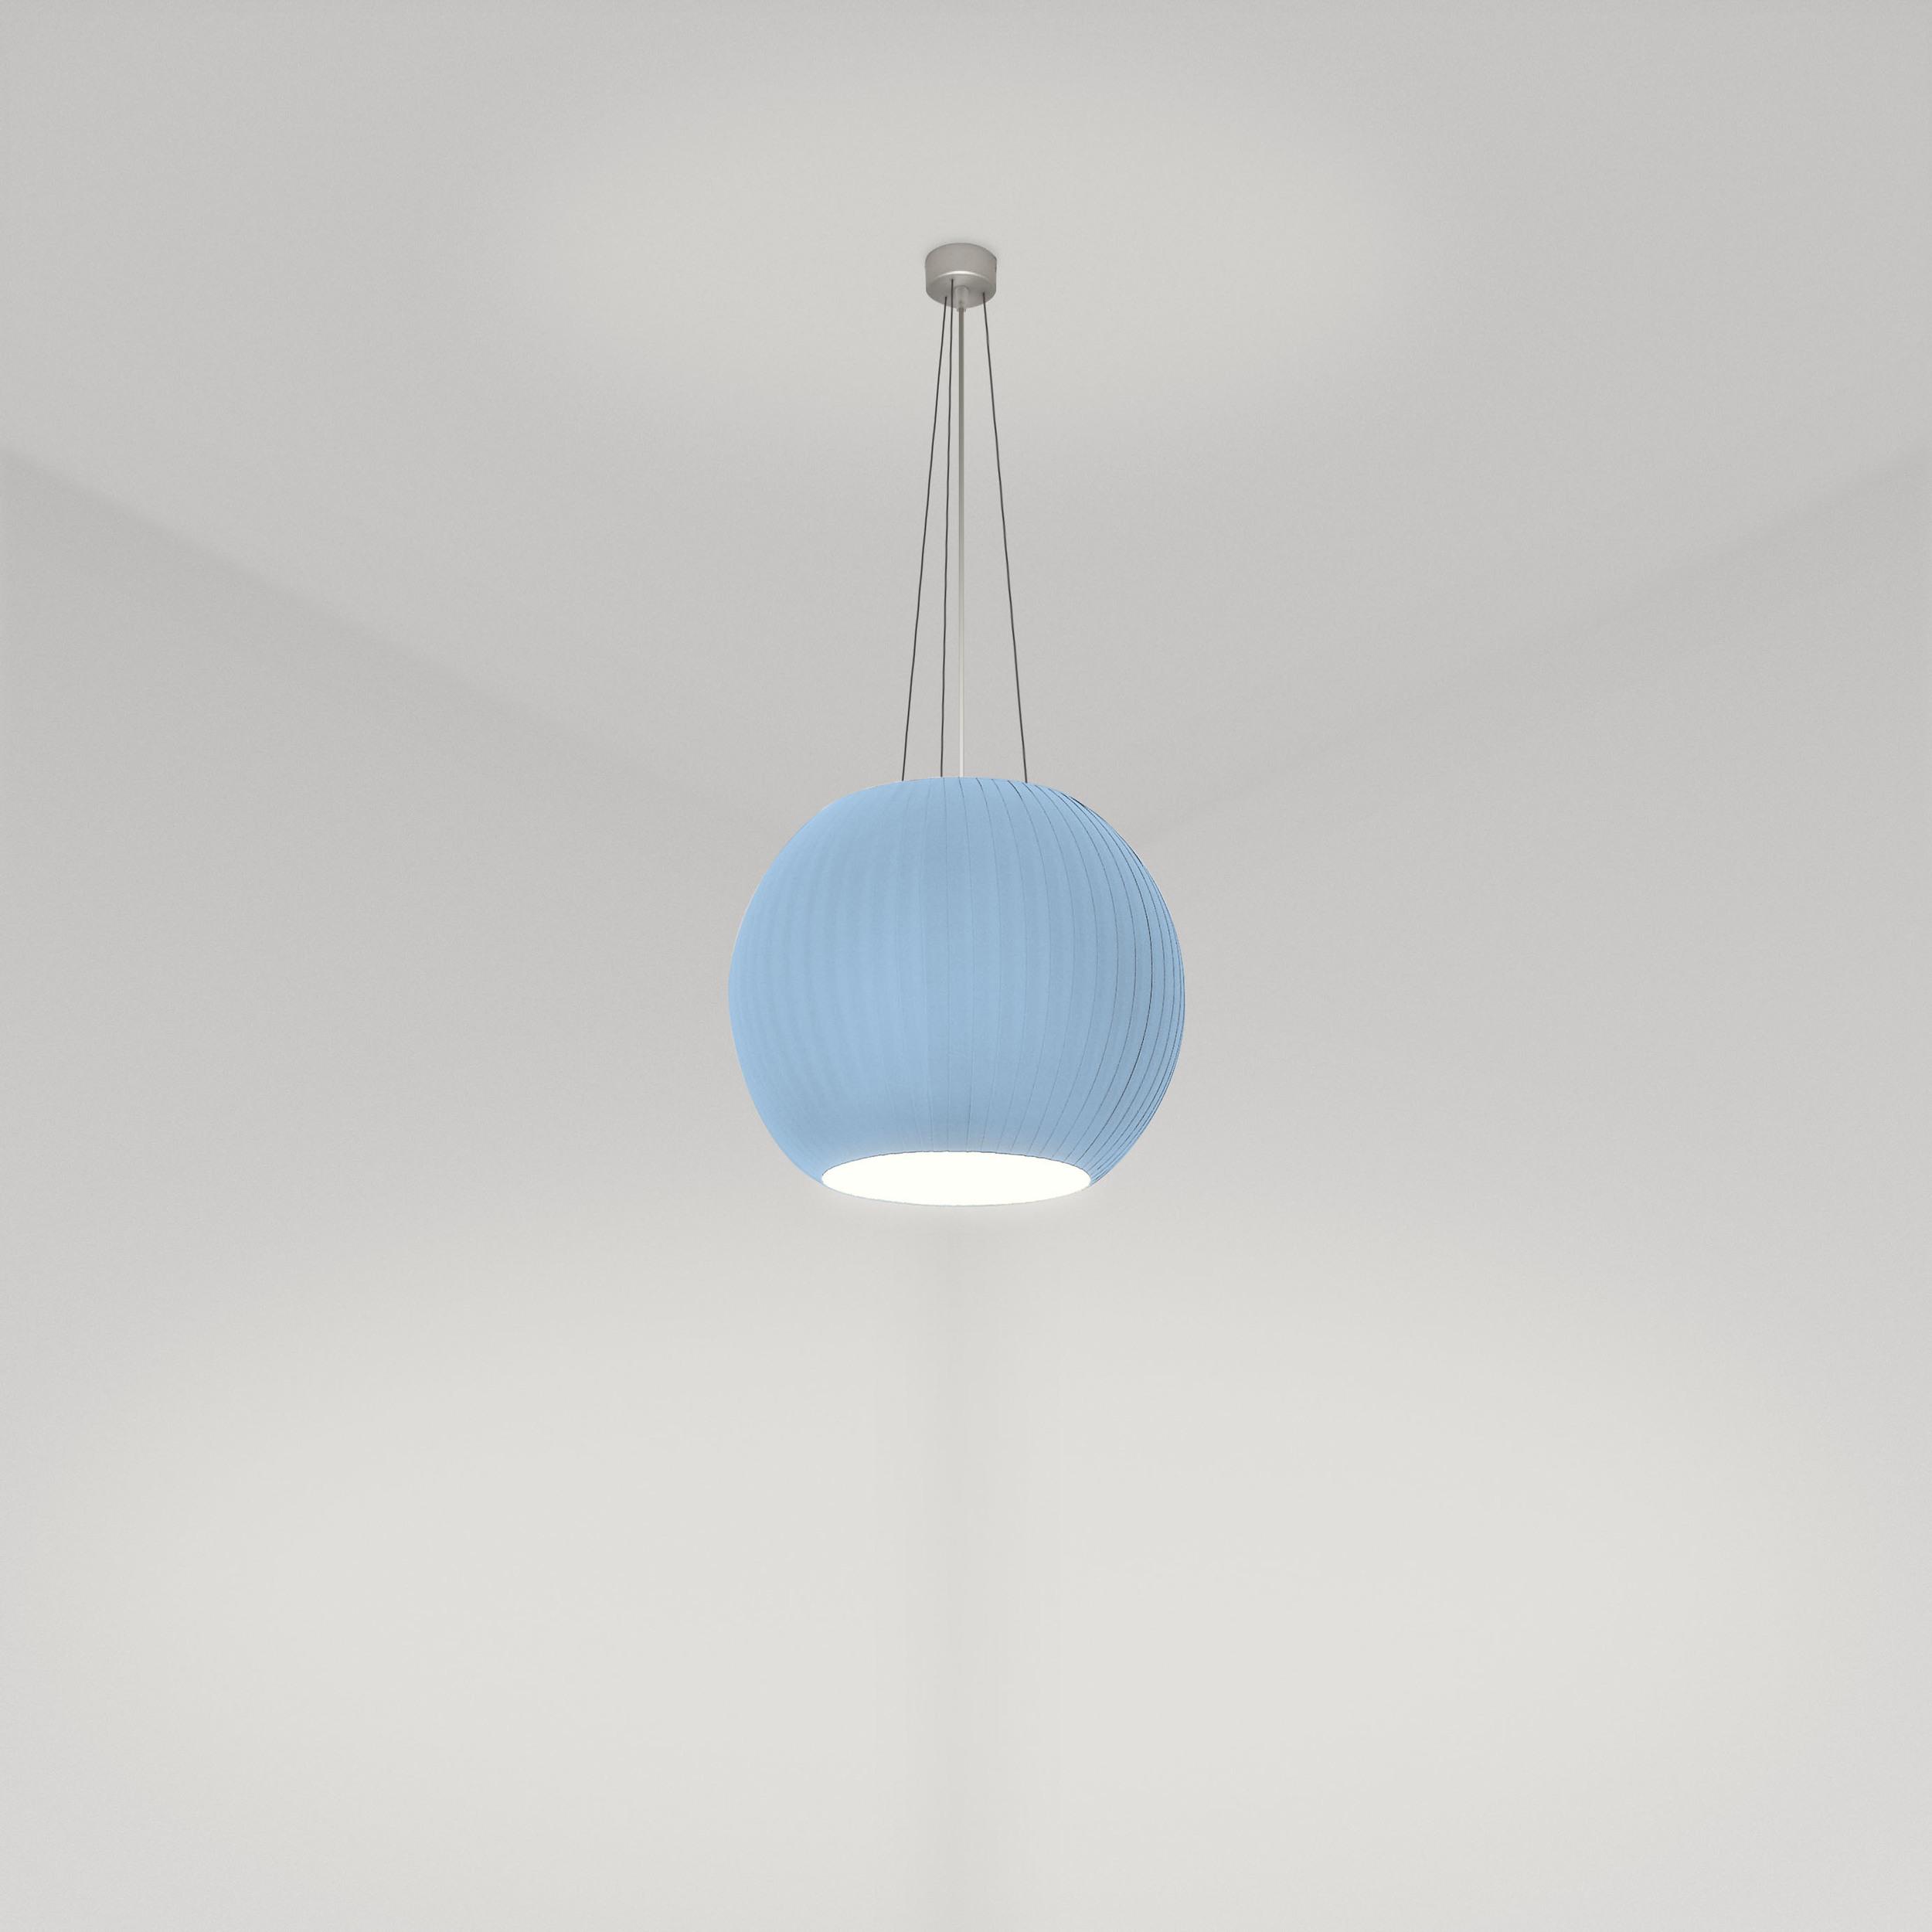 orbit_500_pendant_sky blue.jpg